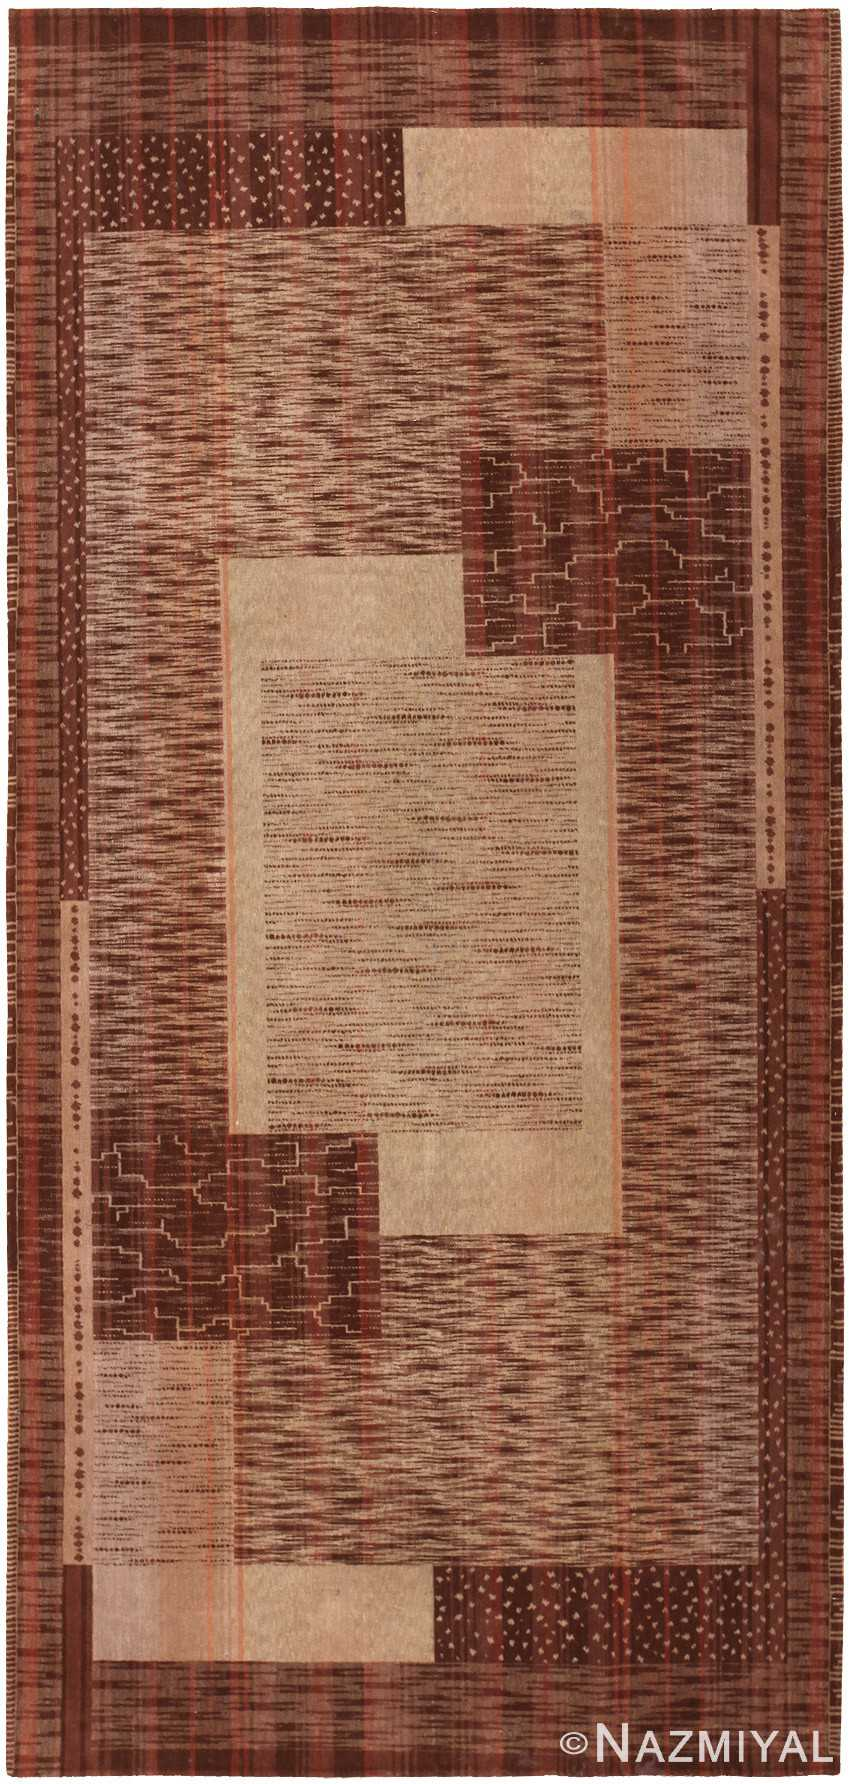 Antique French Art Deco Textile 46876 Nazmiyal